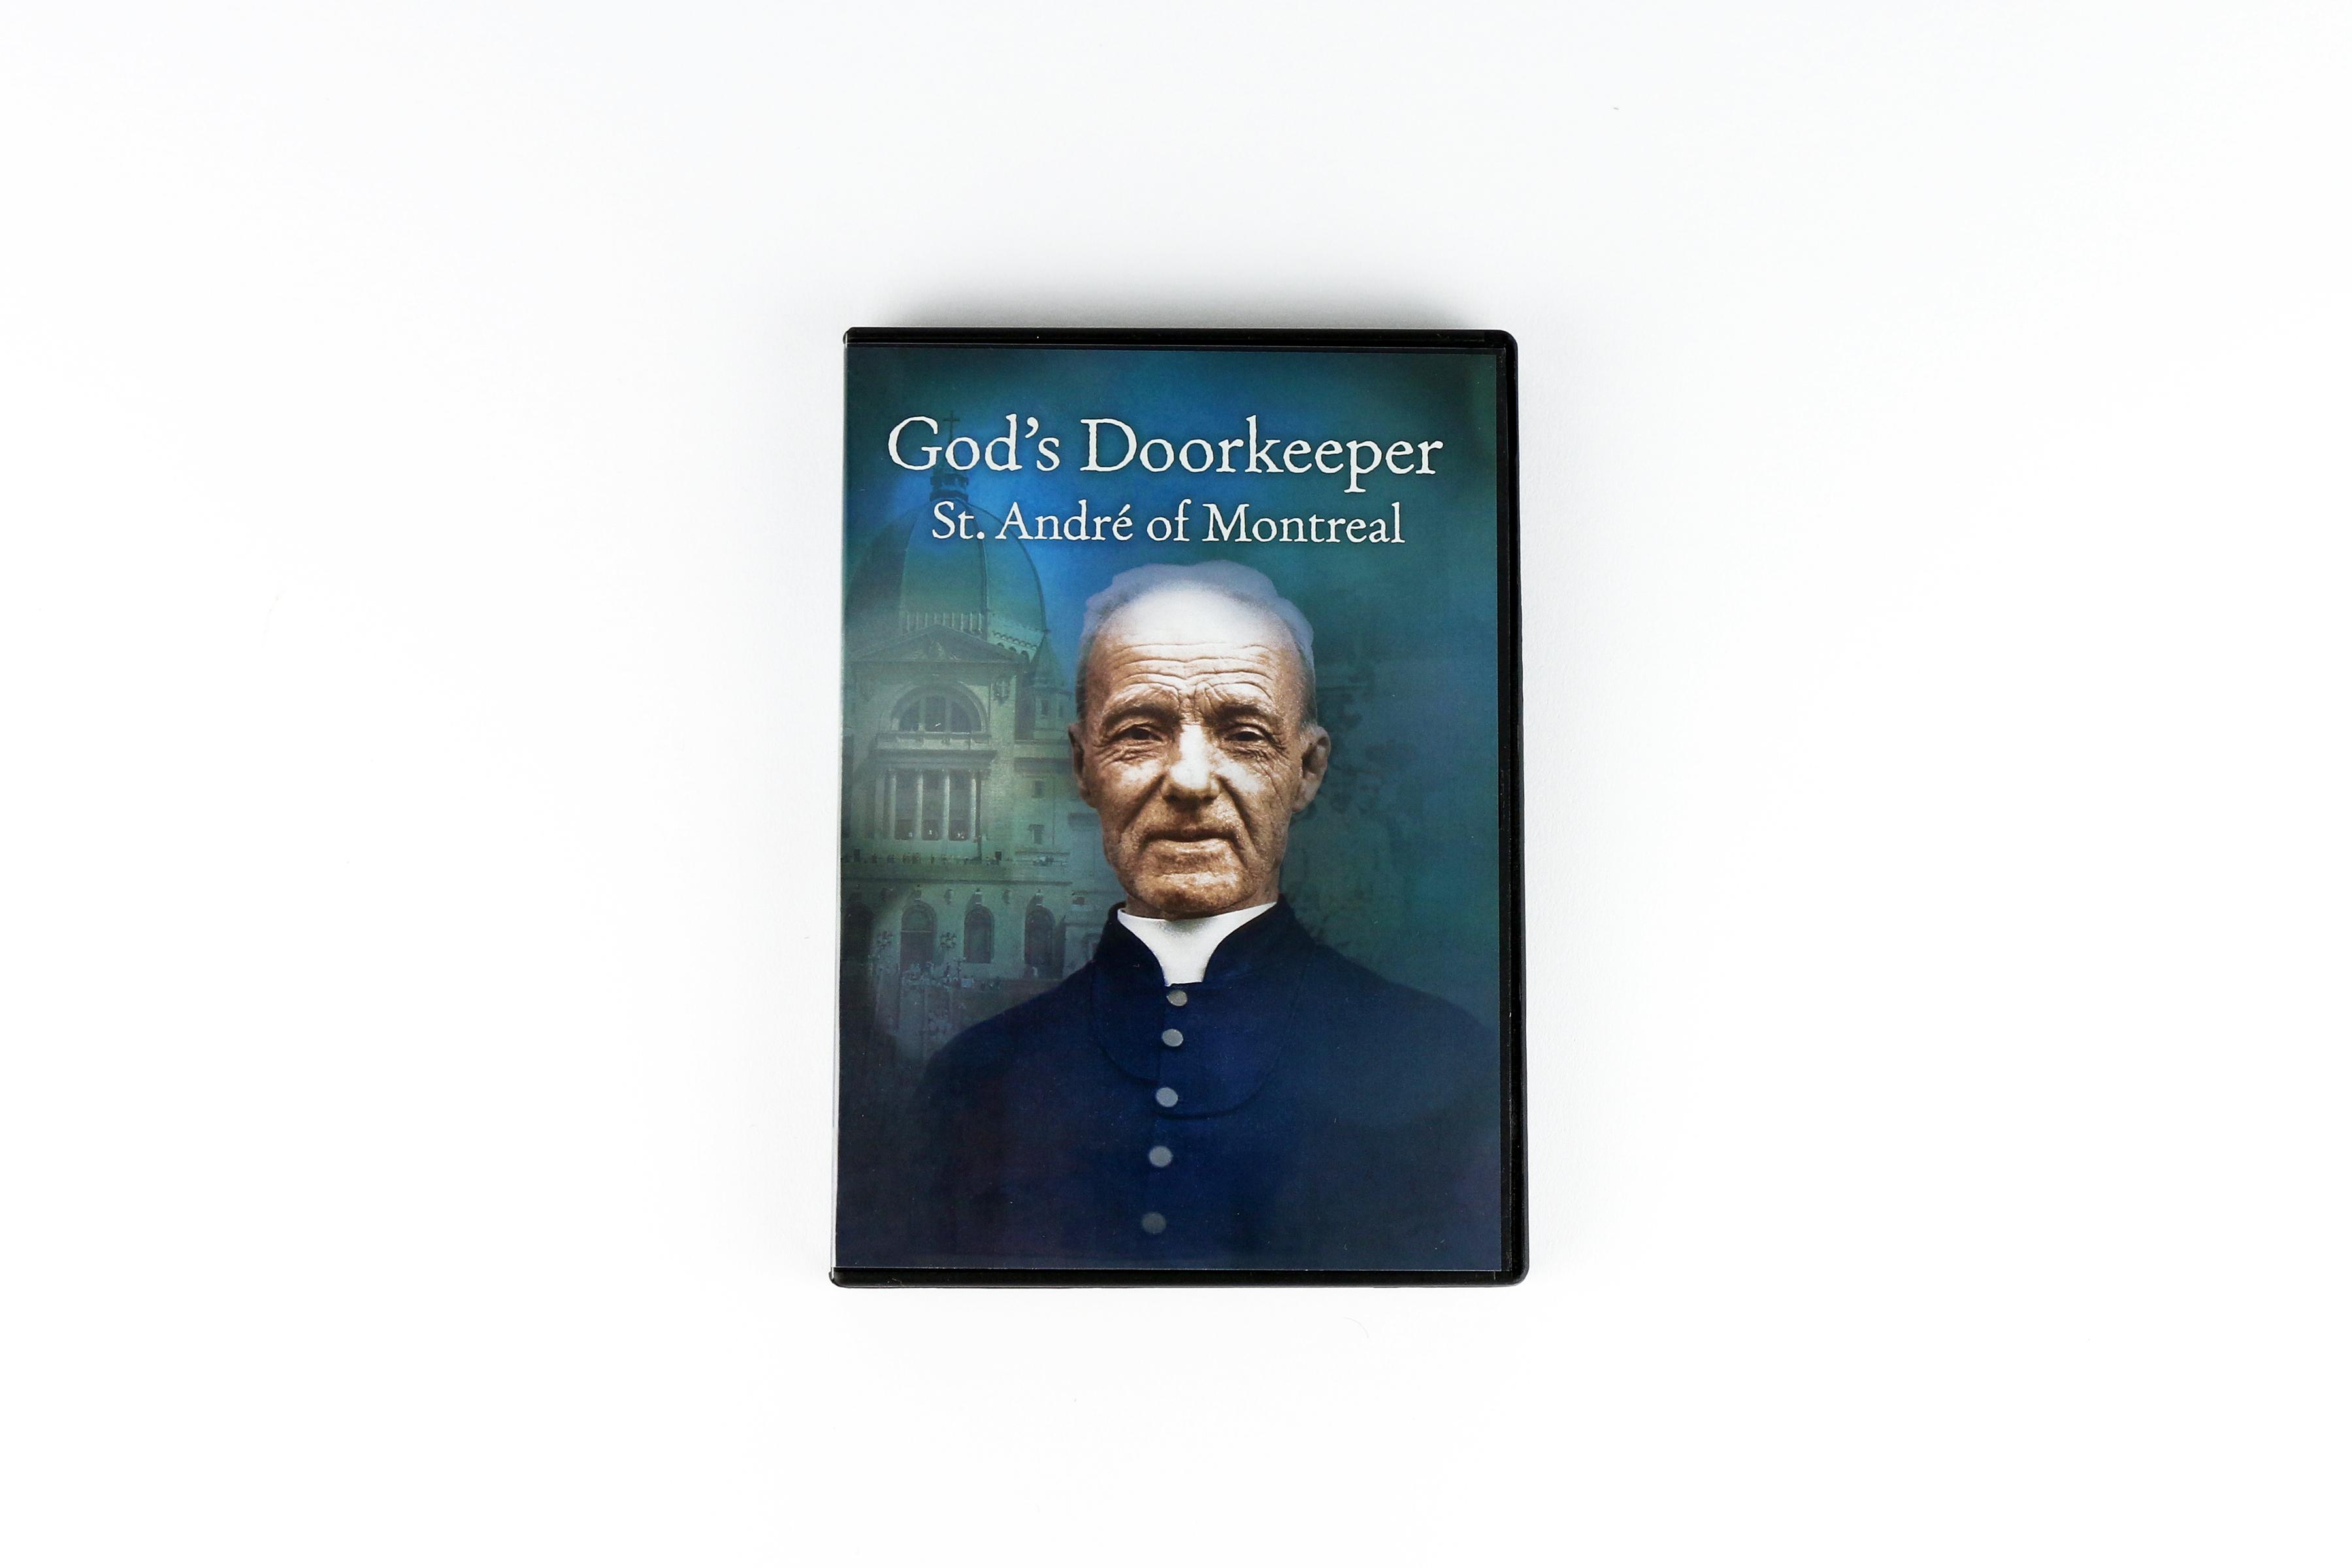 God's doorkeeper: St. André of Montreal